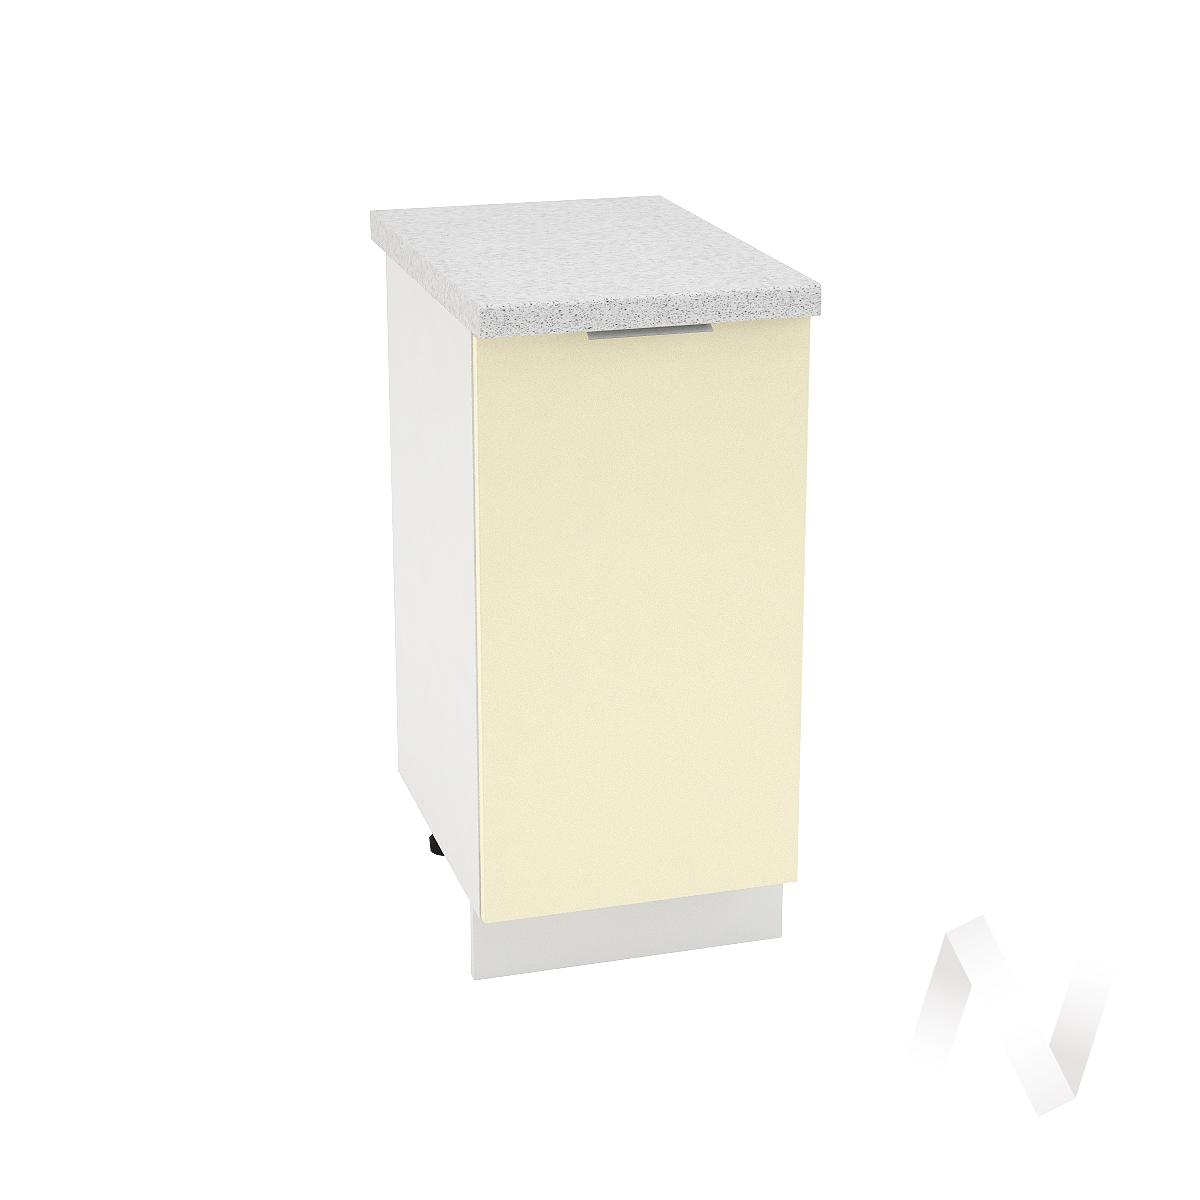 "Кухня ""Терра"": Шкаф нижний левый 400, ШН 400 (ваниль софт/корпус белый)"